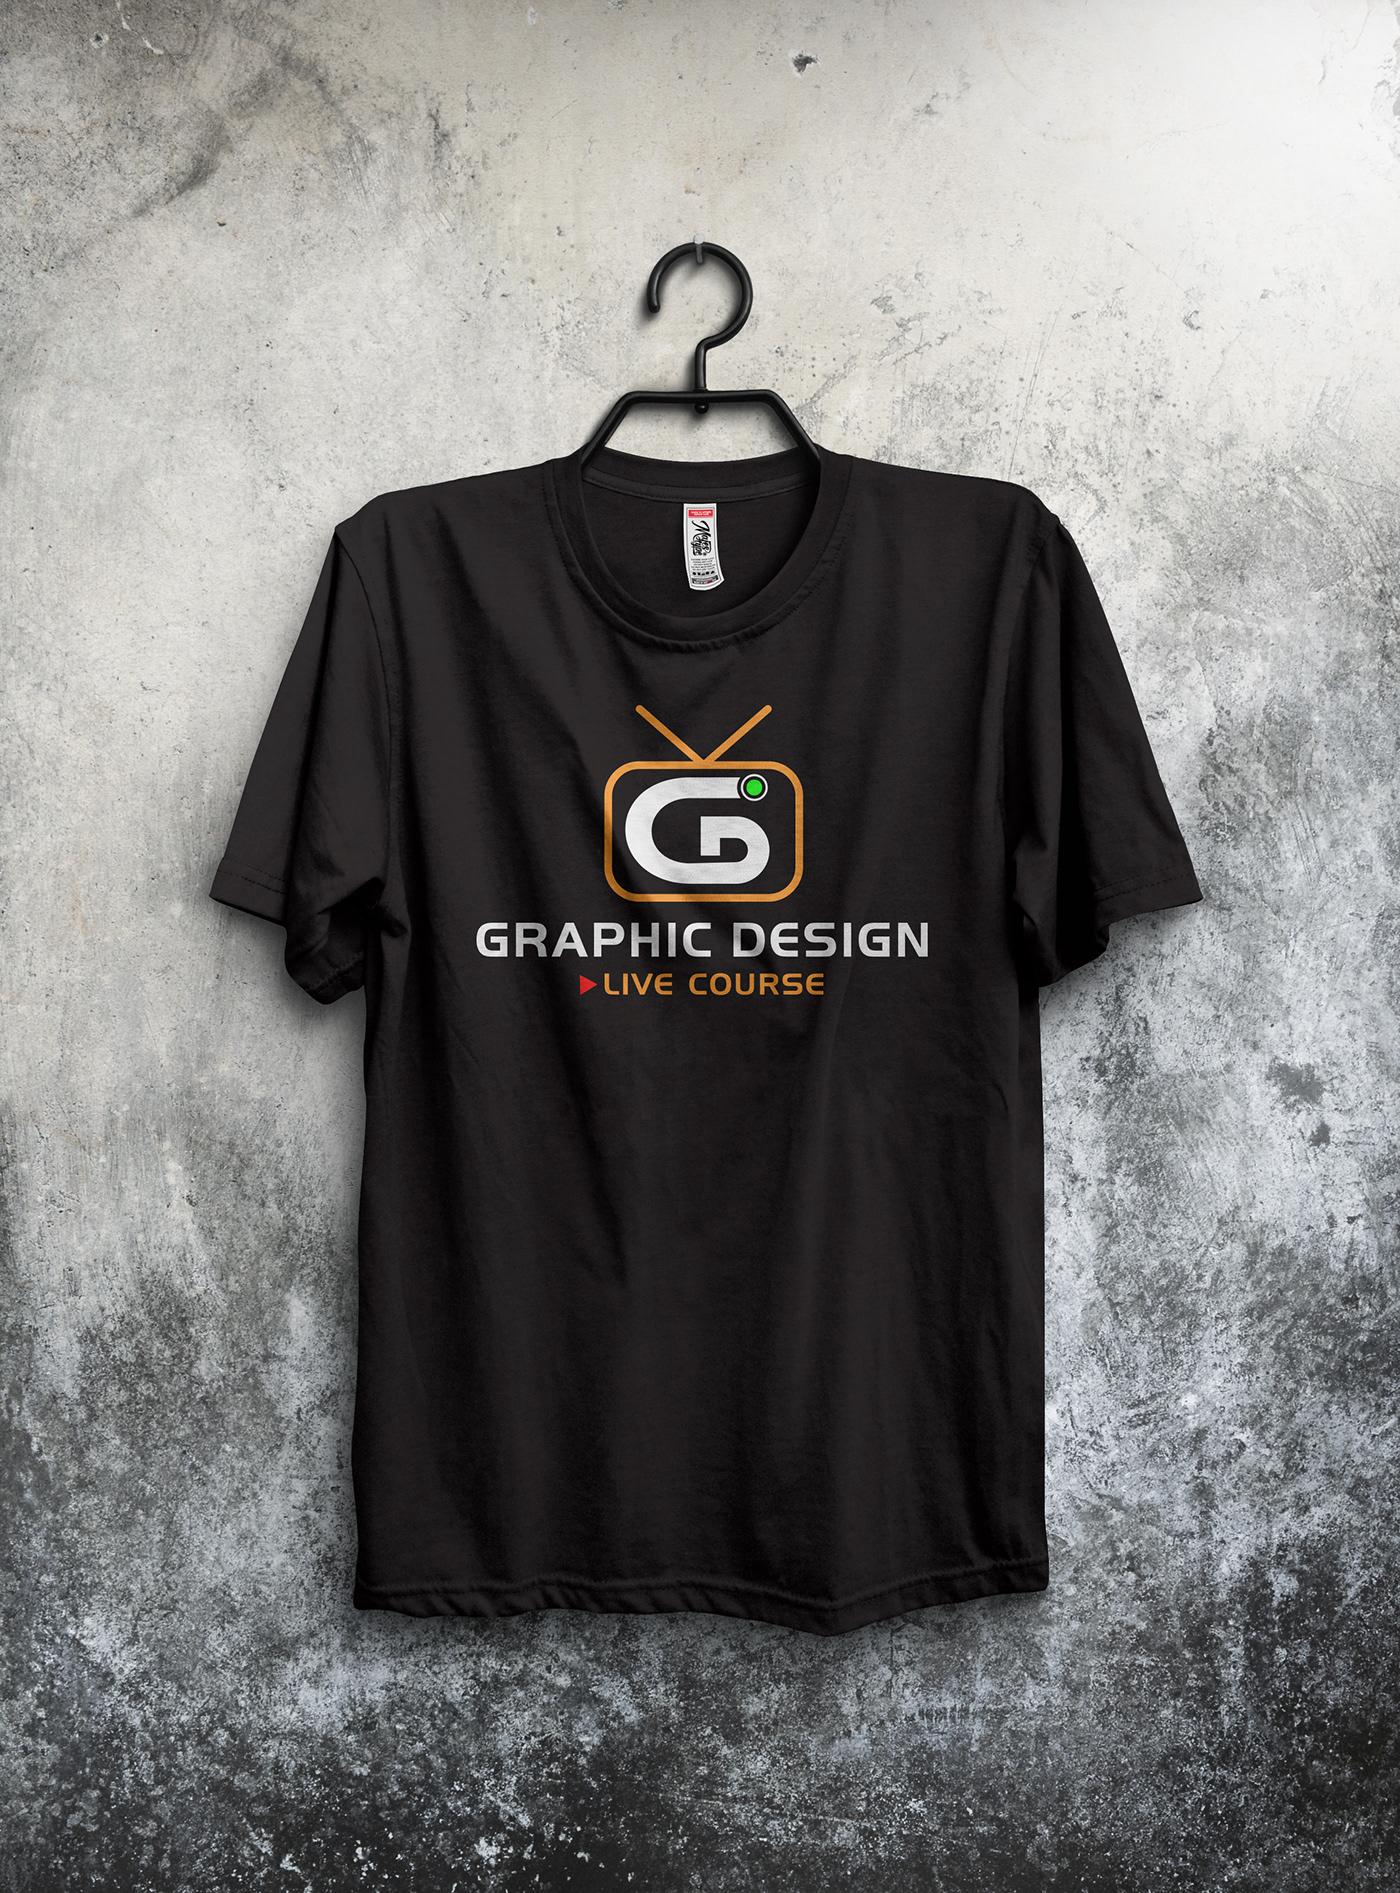 T Shirt Mockup Free Download On Behance